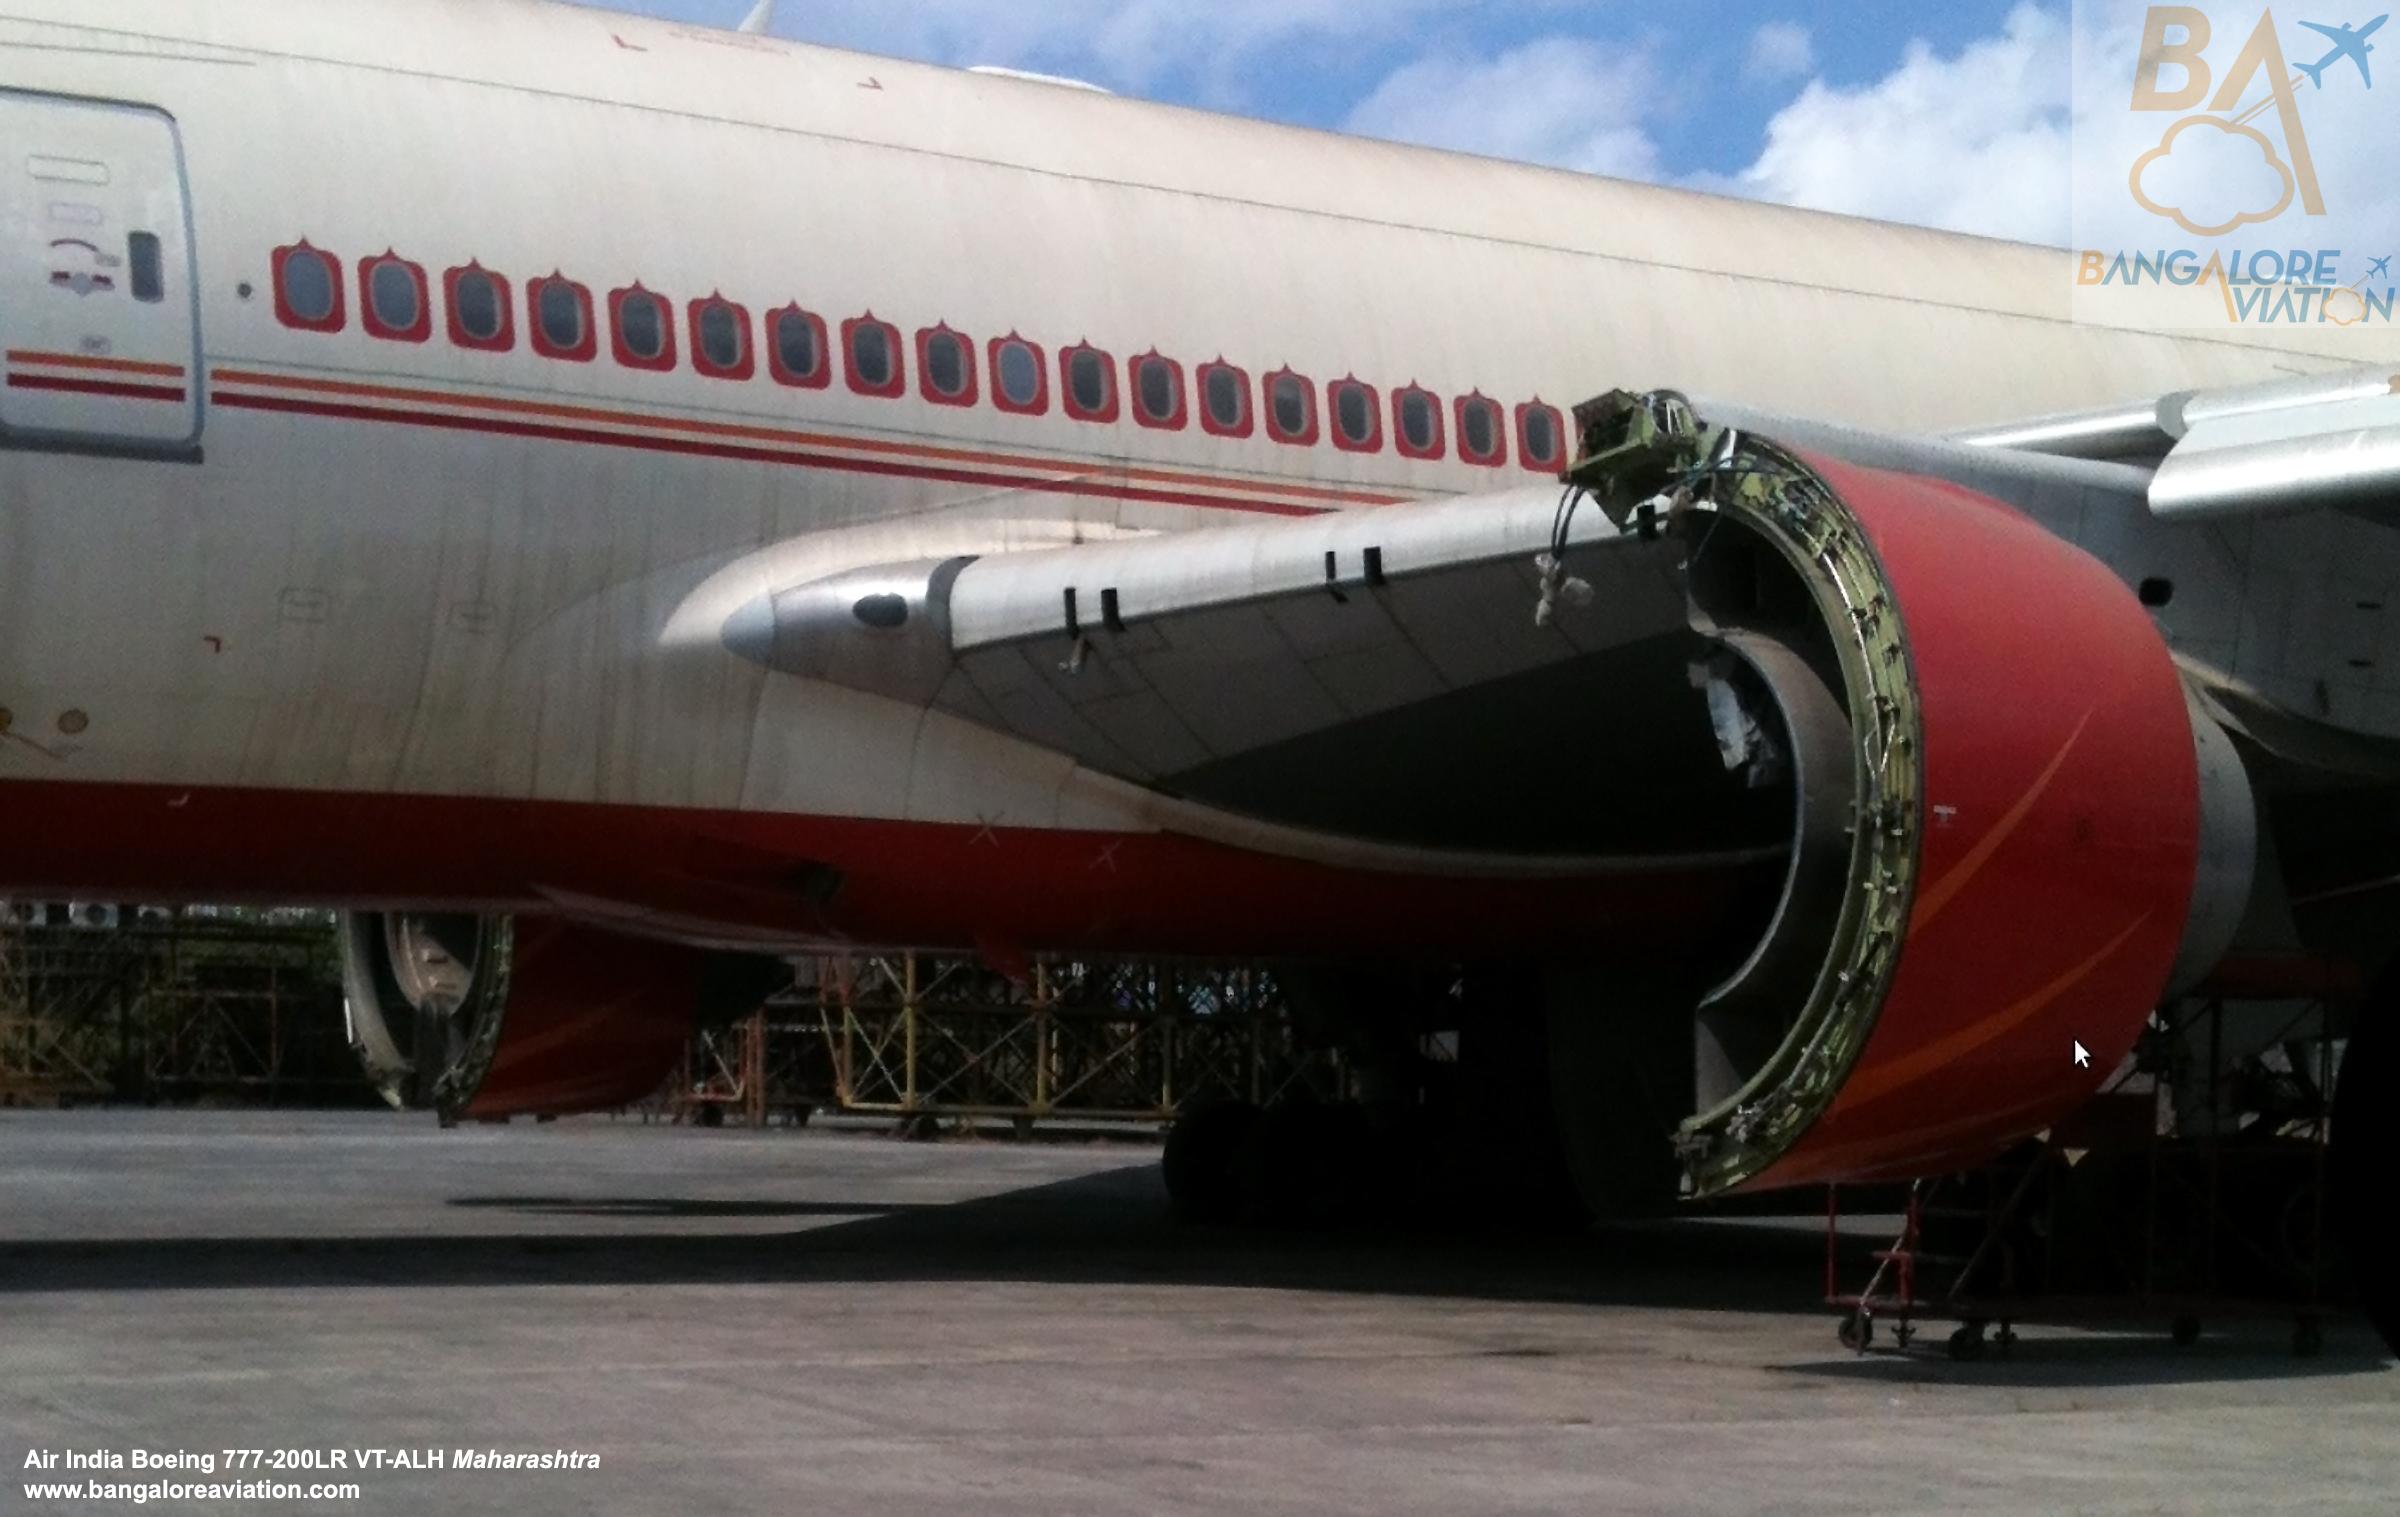 Air India Boeing 777 200LR VT ALH Maharashtra cannibalised at Mumbai's